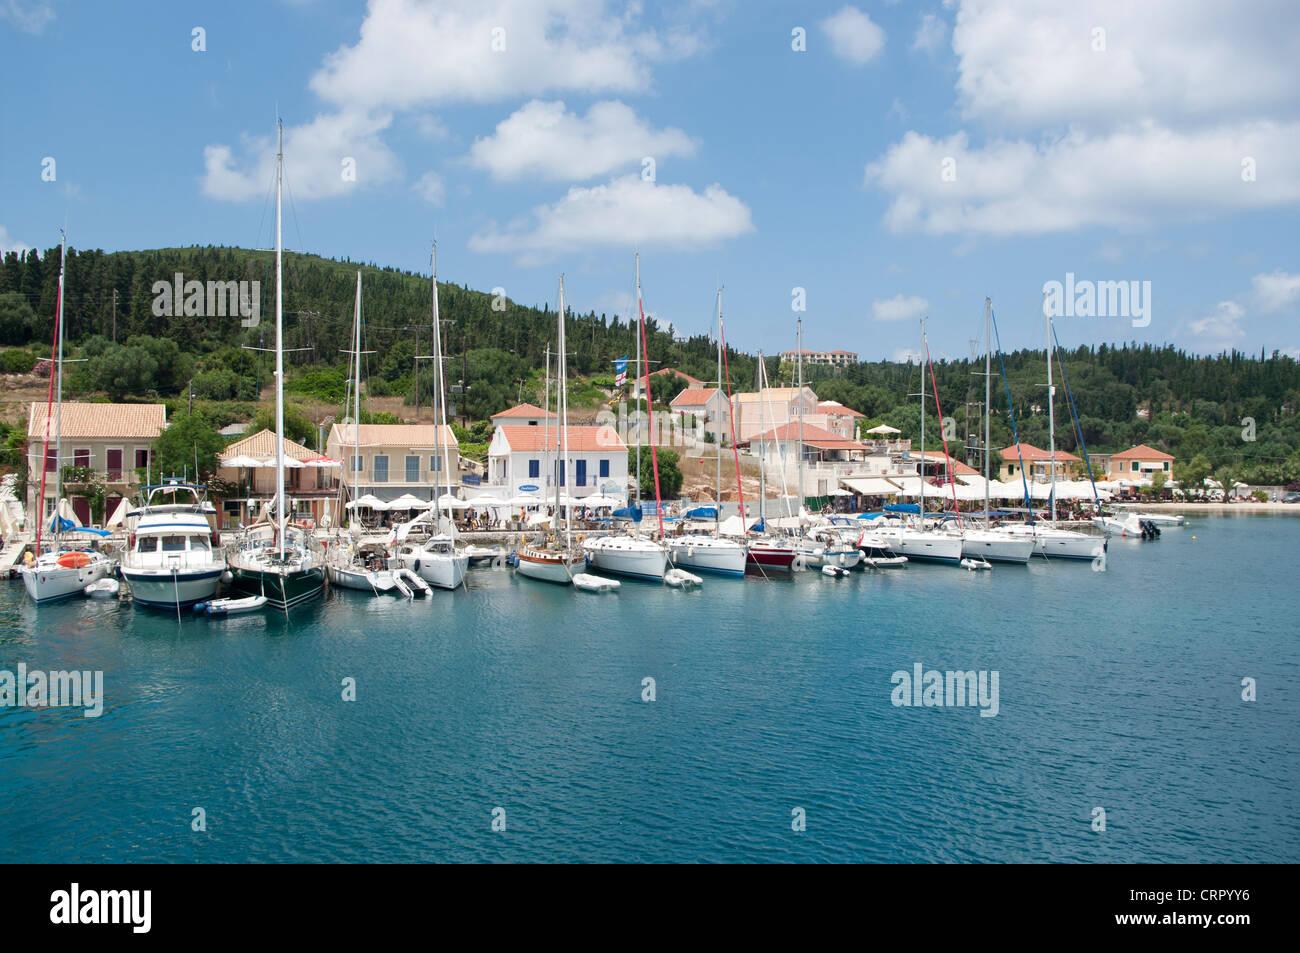 Yacht Harbor, Fiskardo, Kefalonia, Ionian Islands, Greece - Stock Image